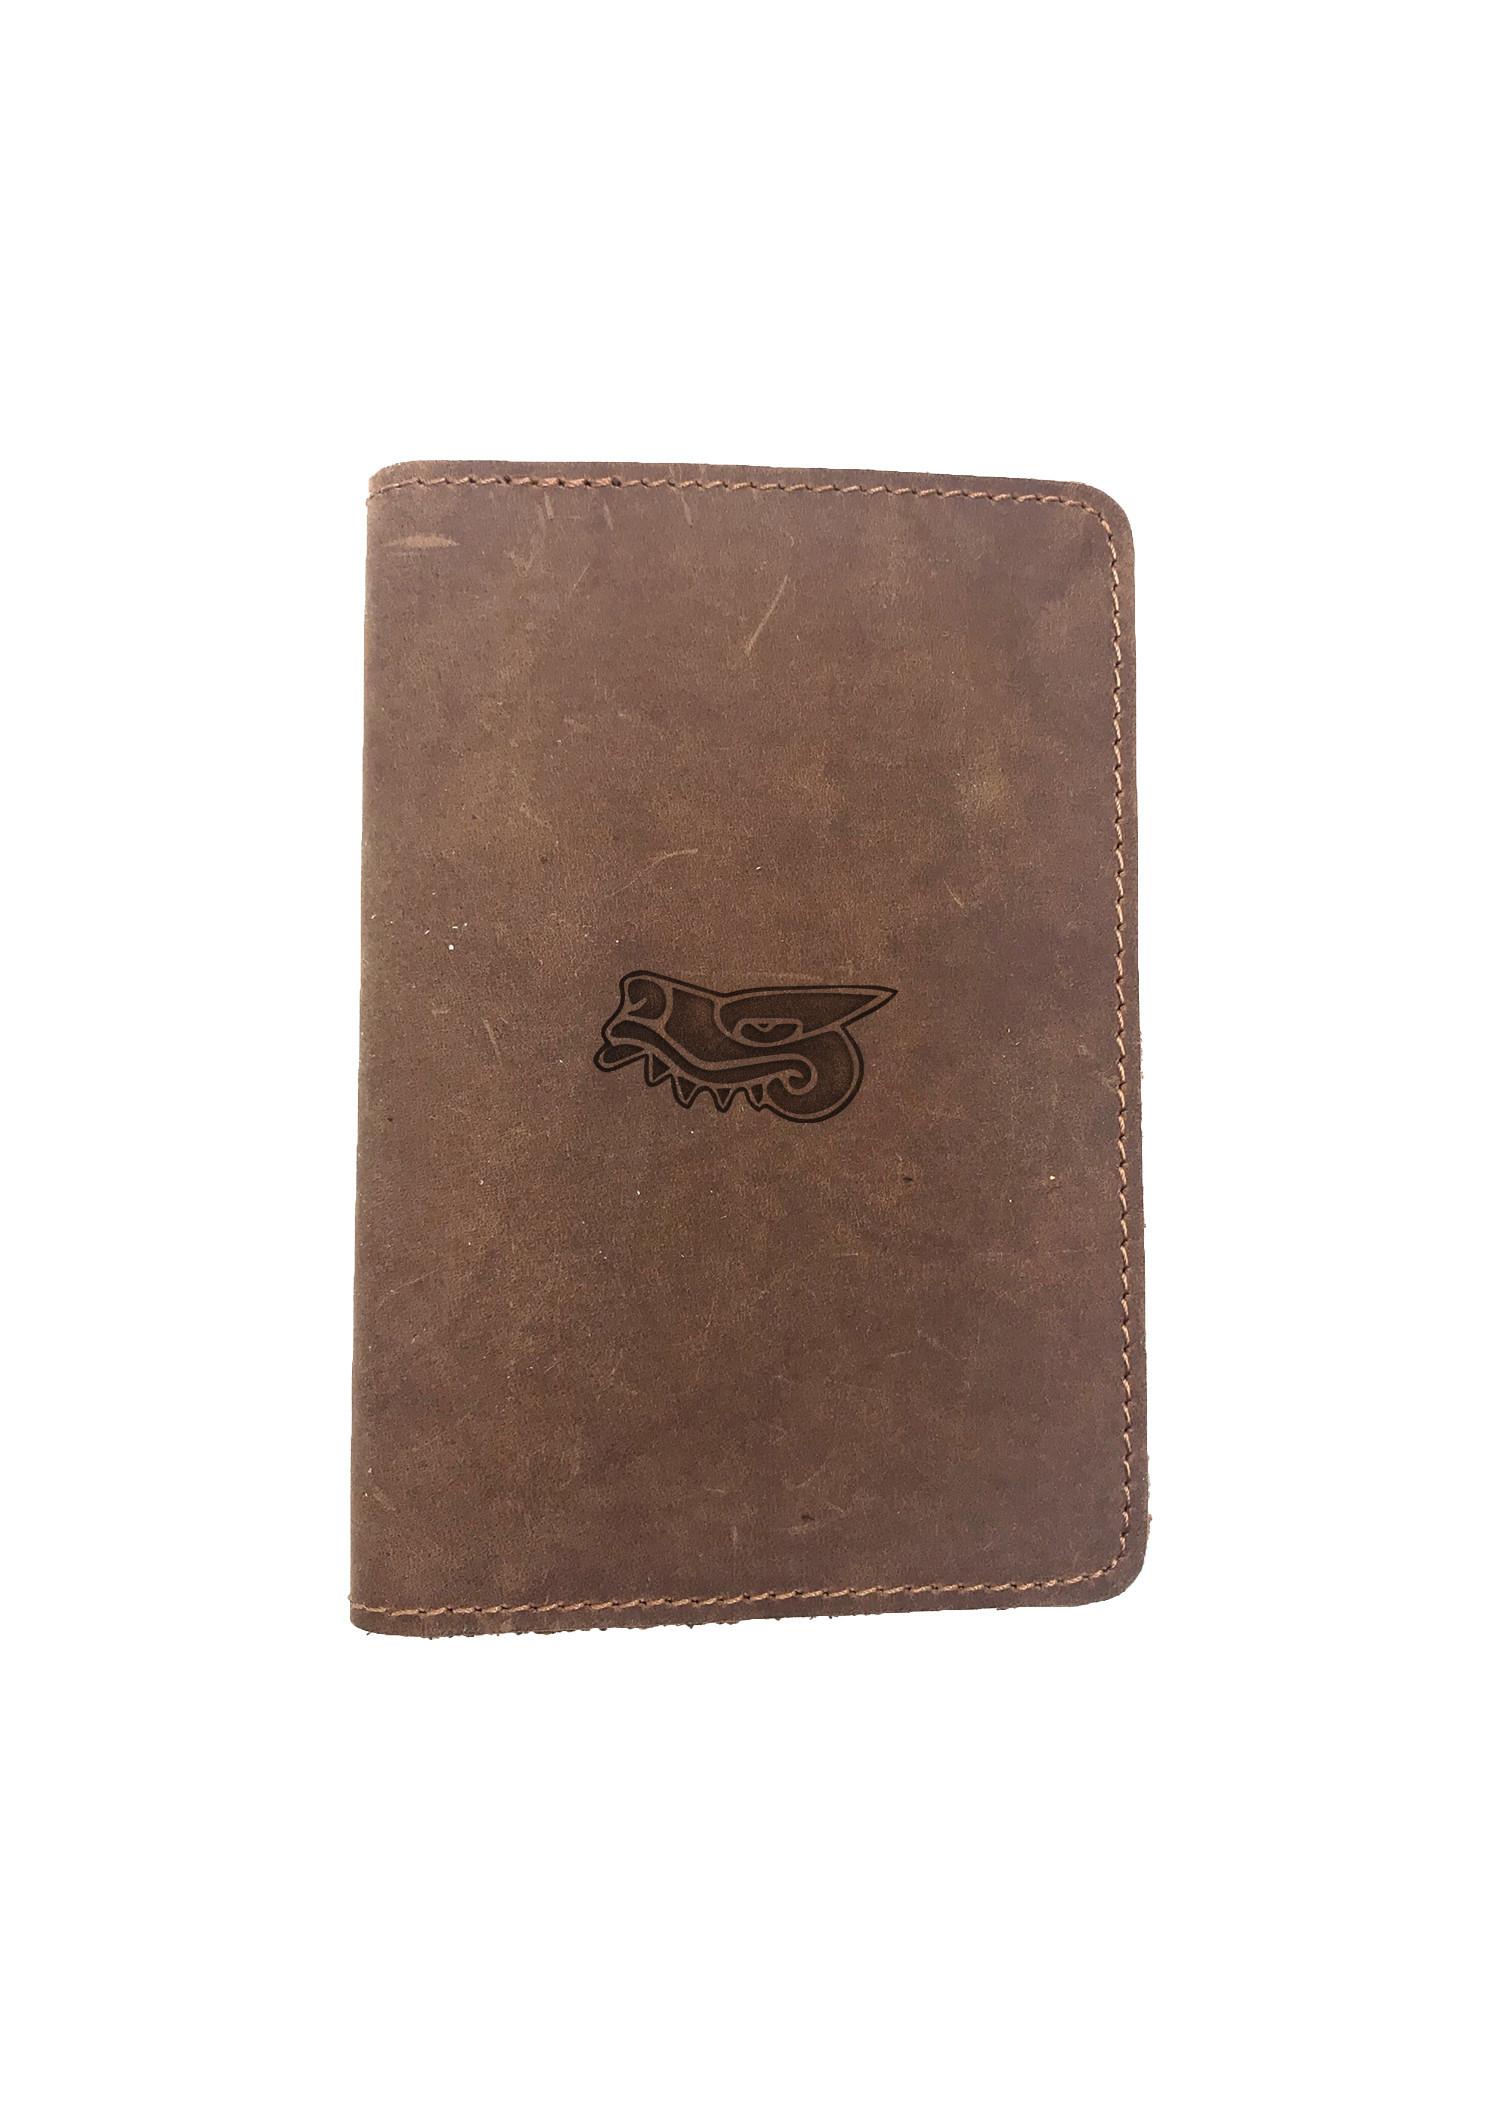 Passport Cover Bao Da Hộ Chiếu Da Sáp Khắc Hình Cá sấu ATECE ALLIGATOR SYMBOL (BROWN)